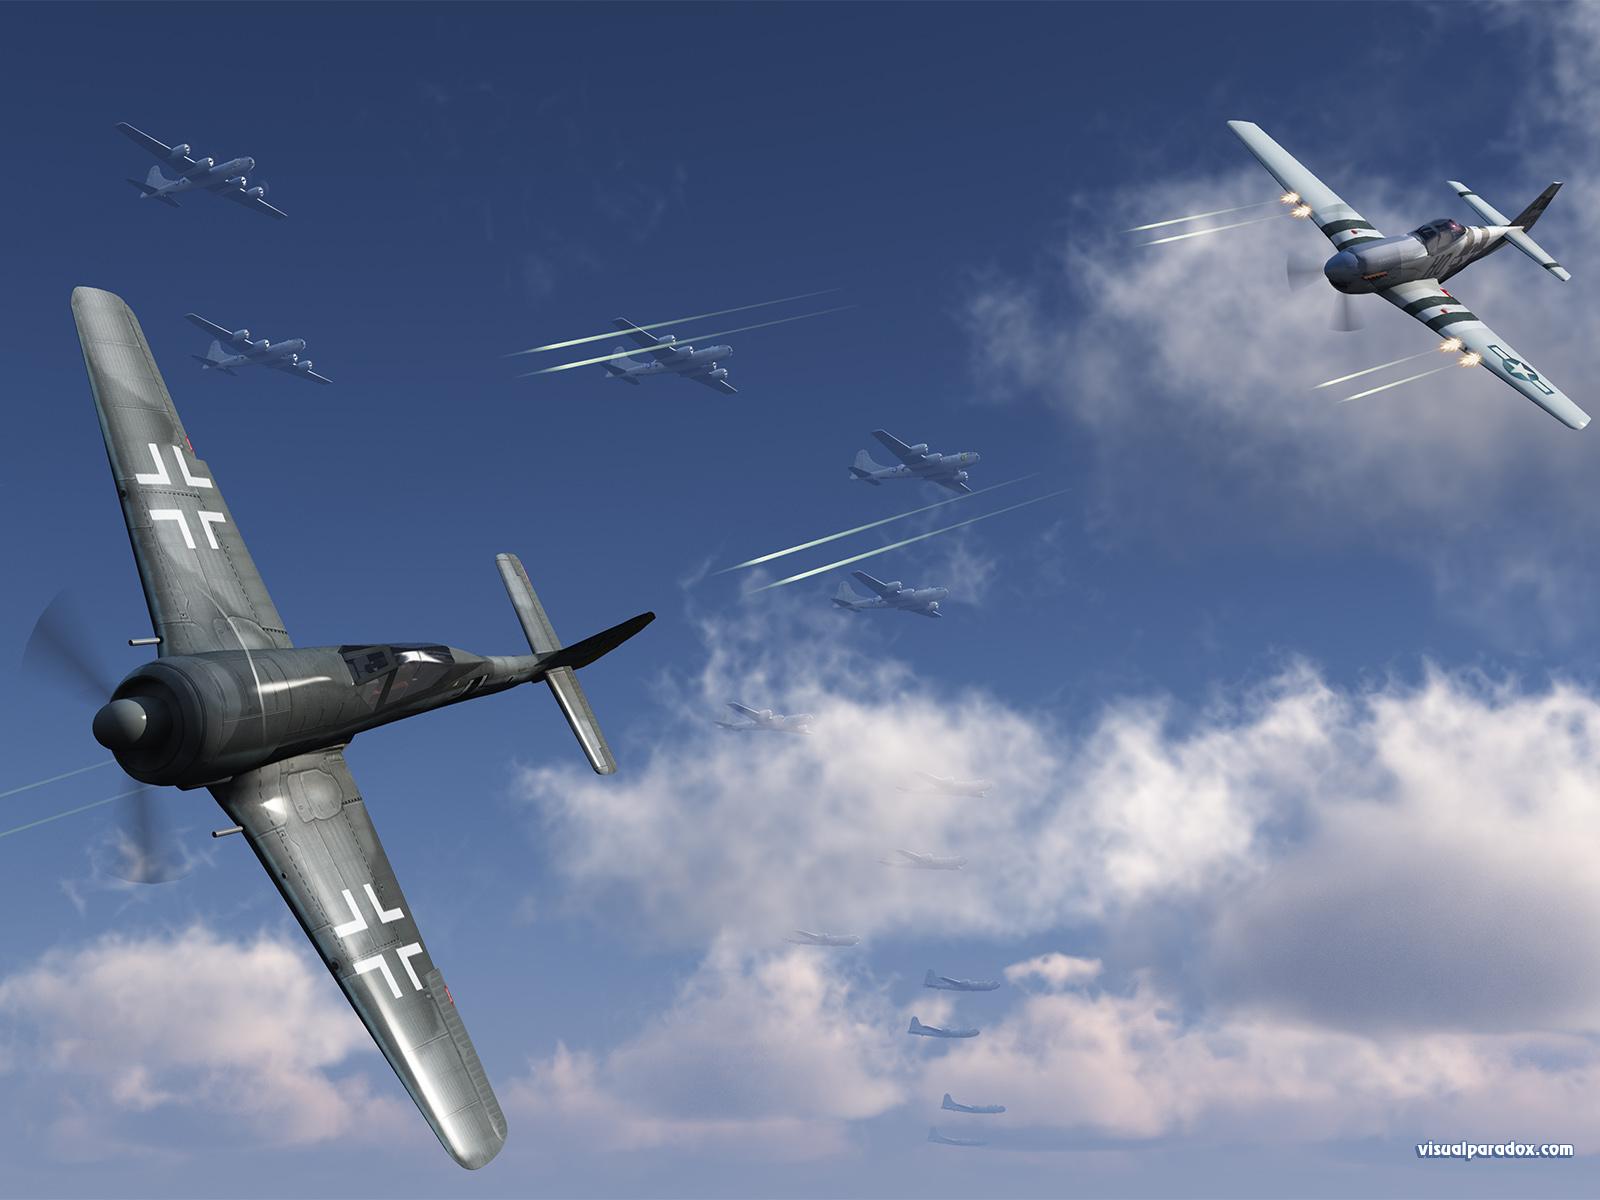 p51 dogfight image